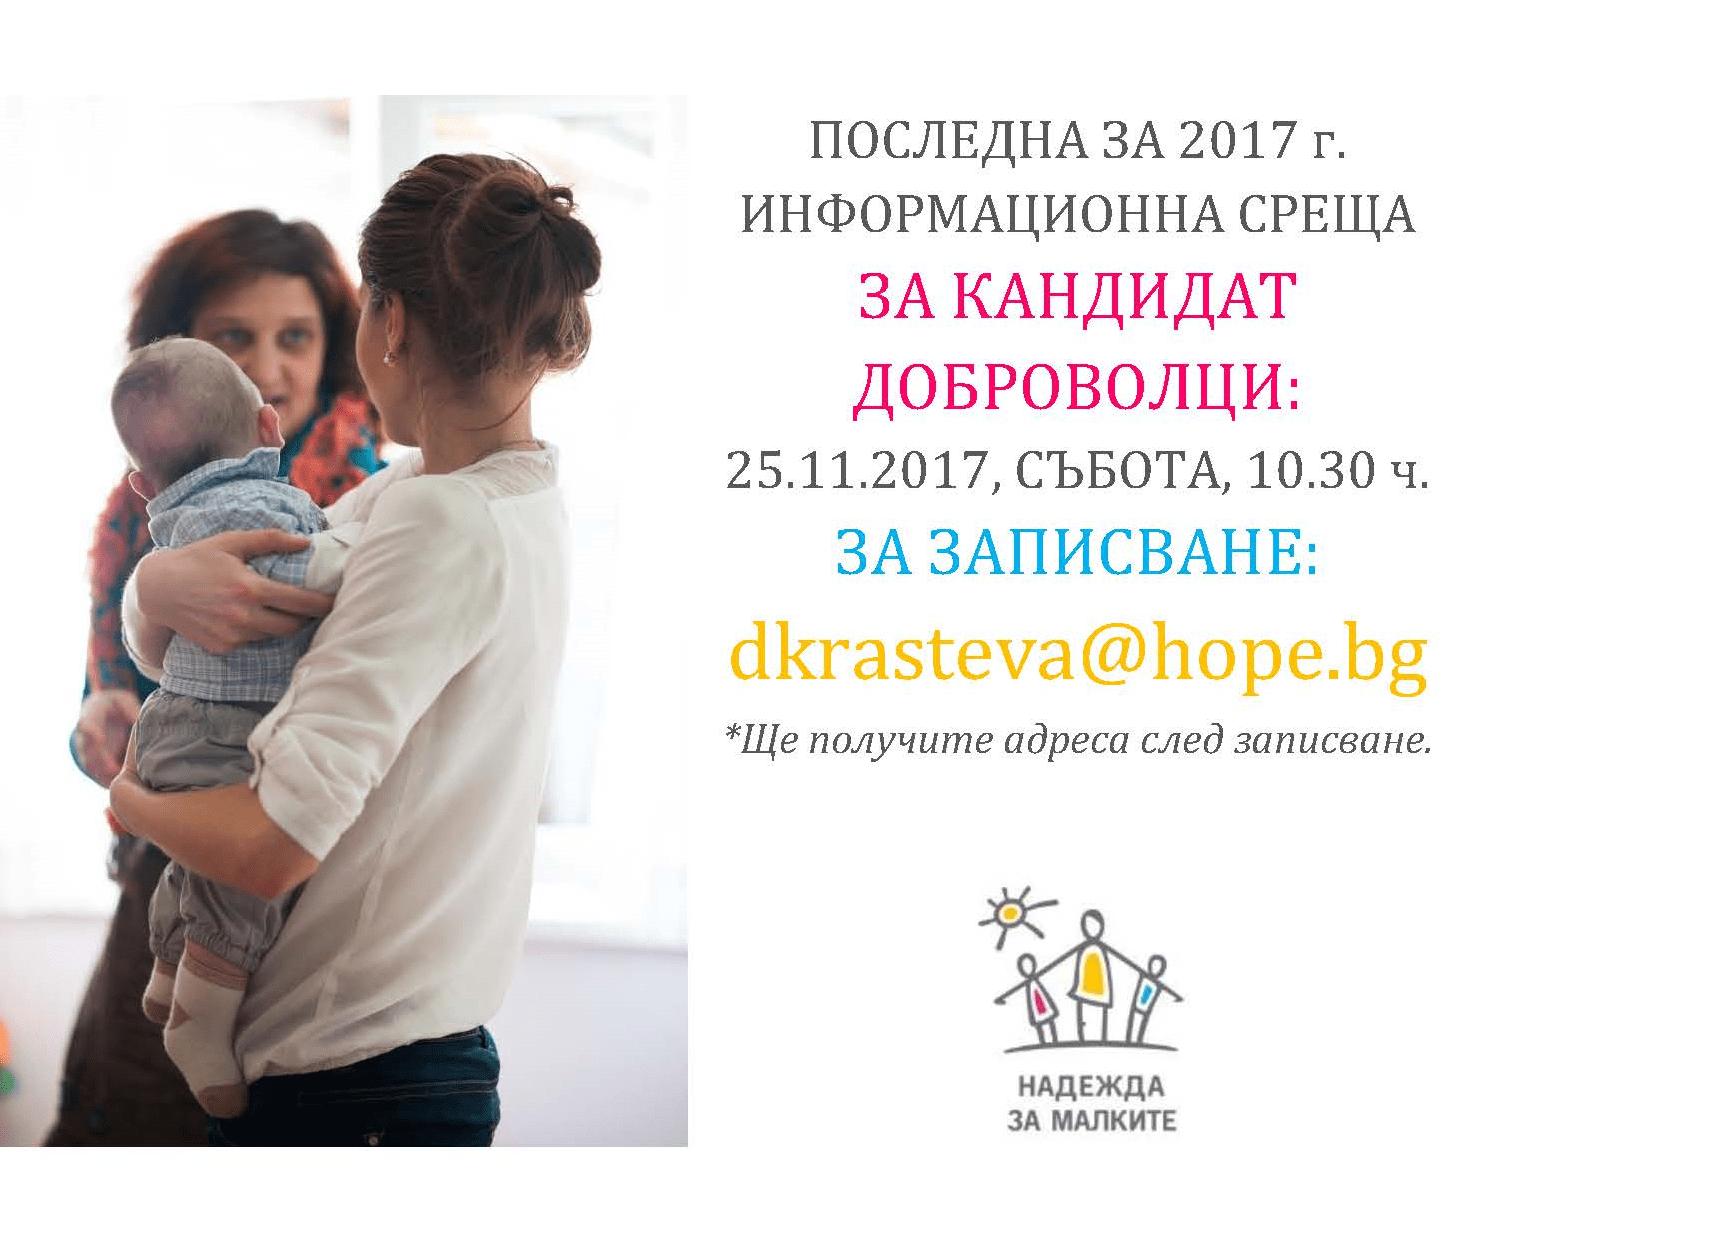 Информационна среща за кандидати за доброволци